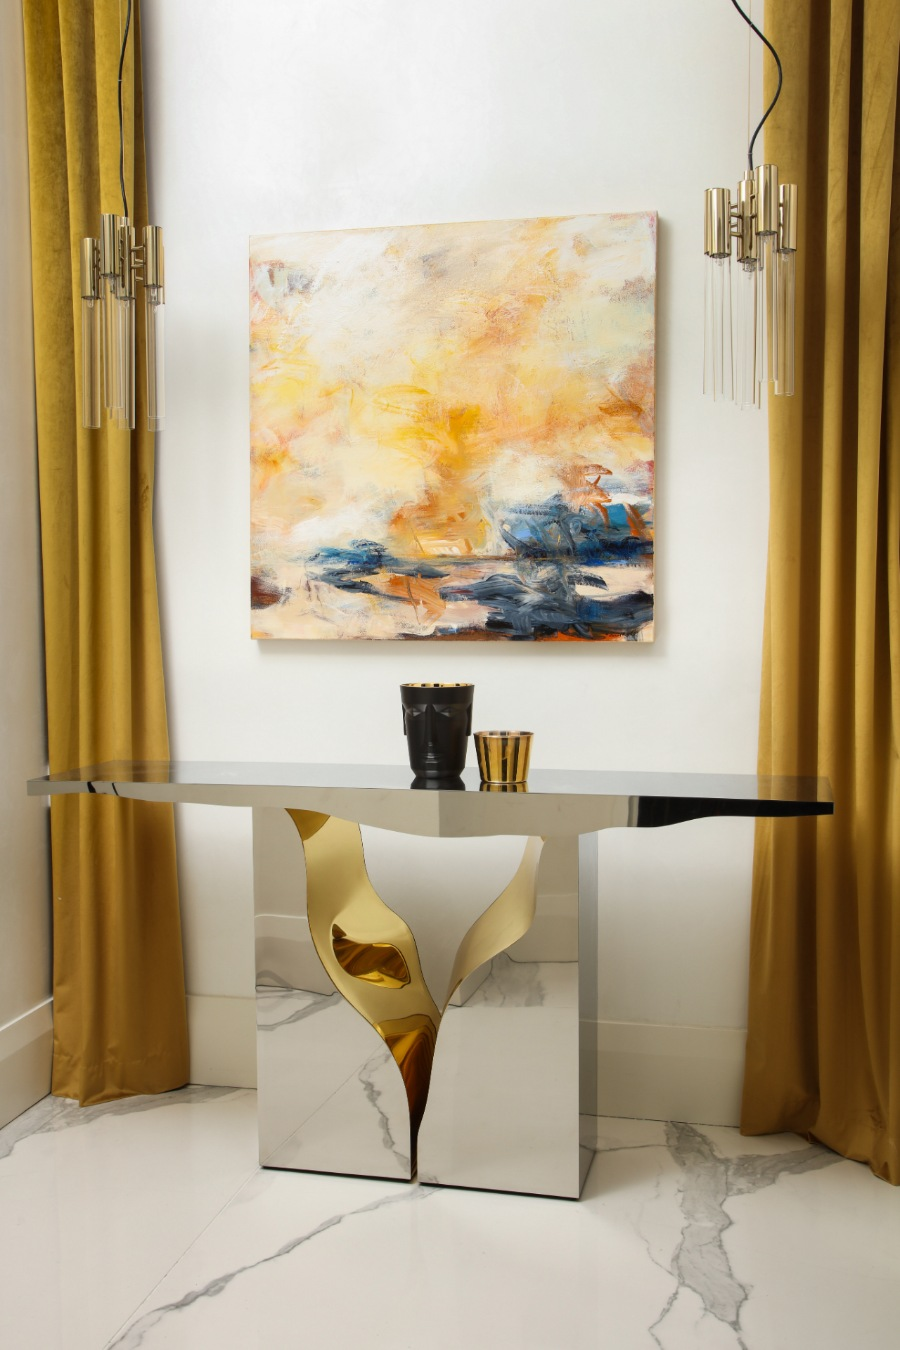 arlene angard Arlene Angard – Energetic, Vibrant and Elegant Arlene Angard Energetic Vibrant and Elegant 2